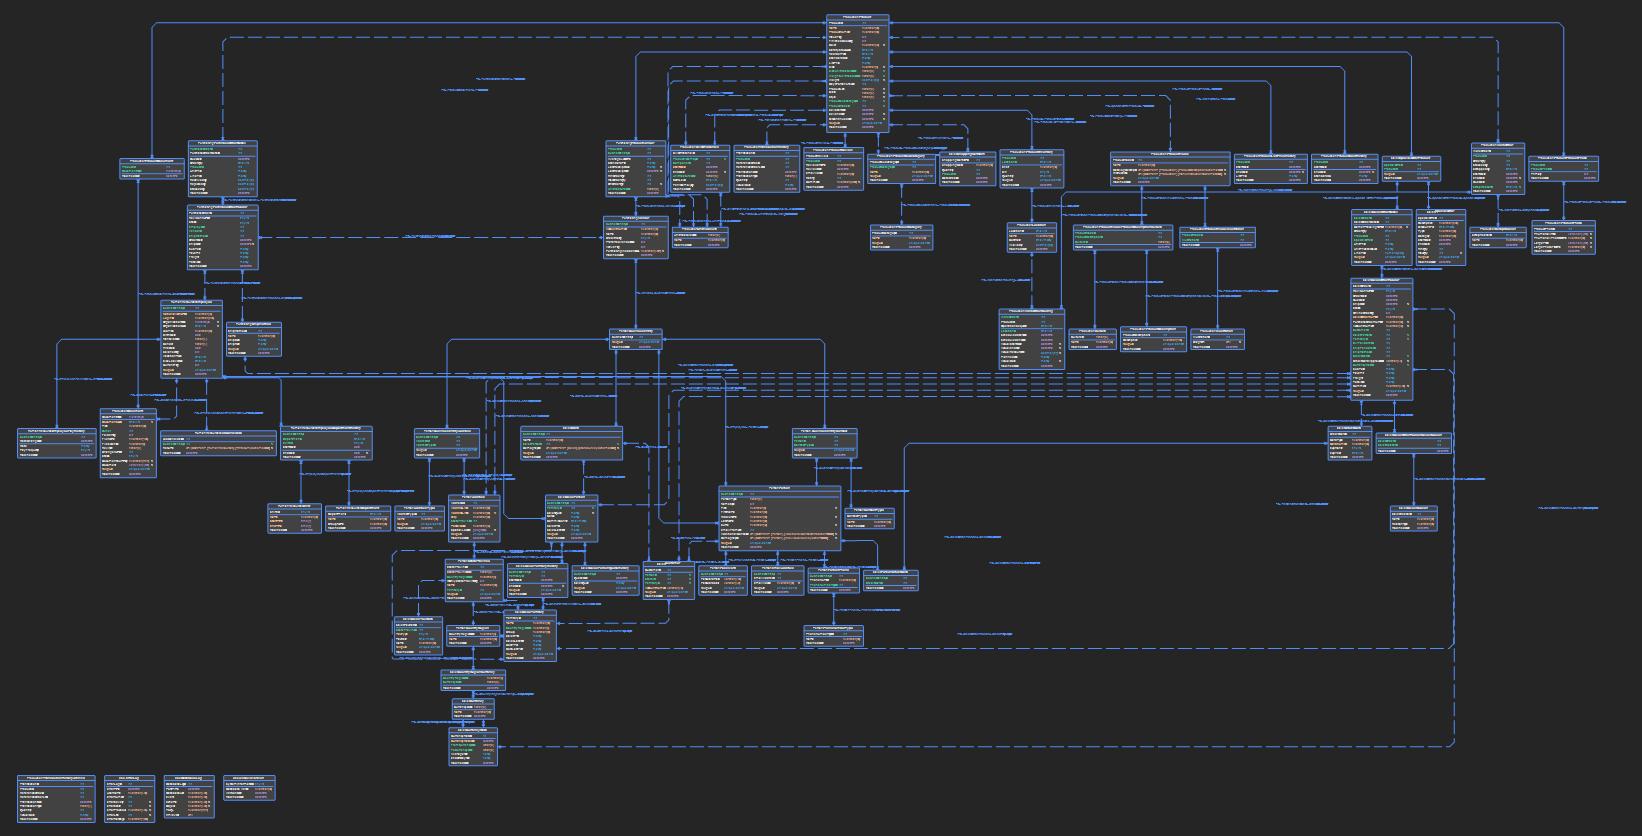 Reverse engineering tour - Visualizing databases with data